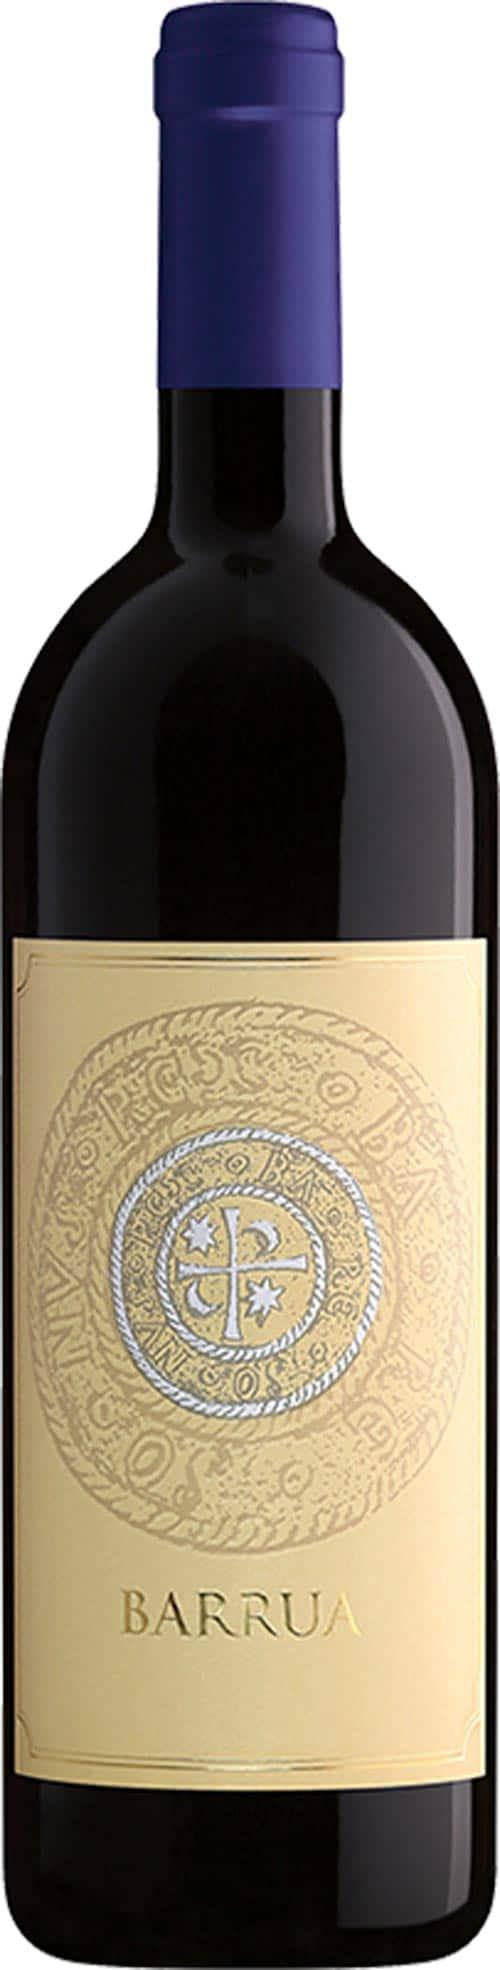 The Agricola Punica Barrua wine bottle.